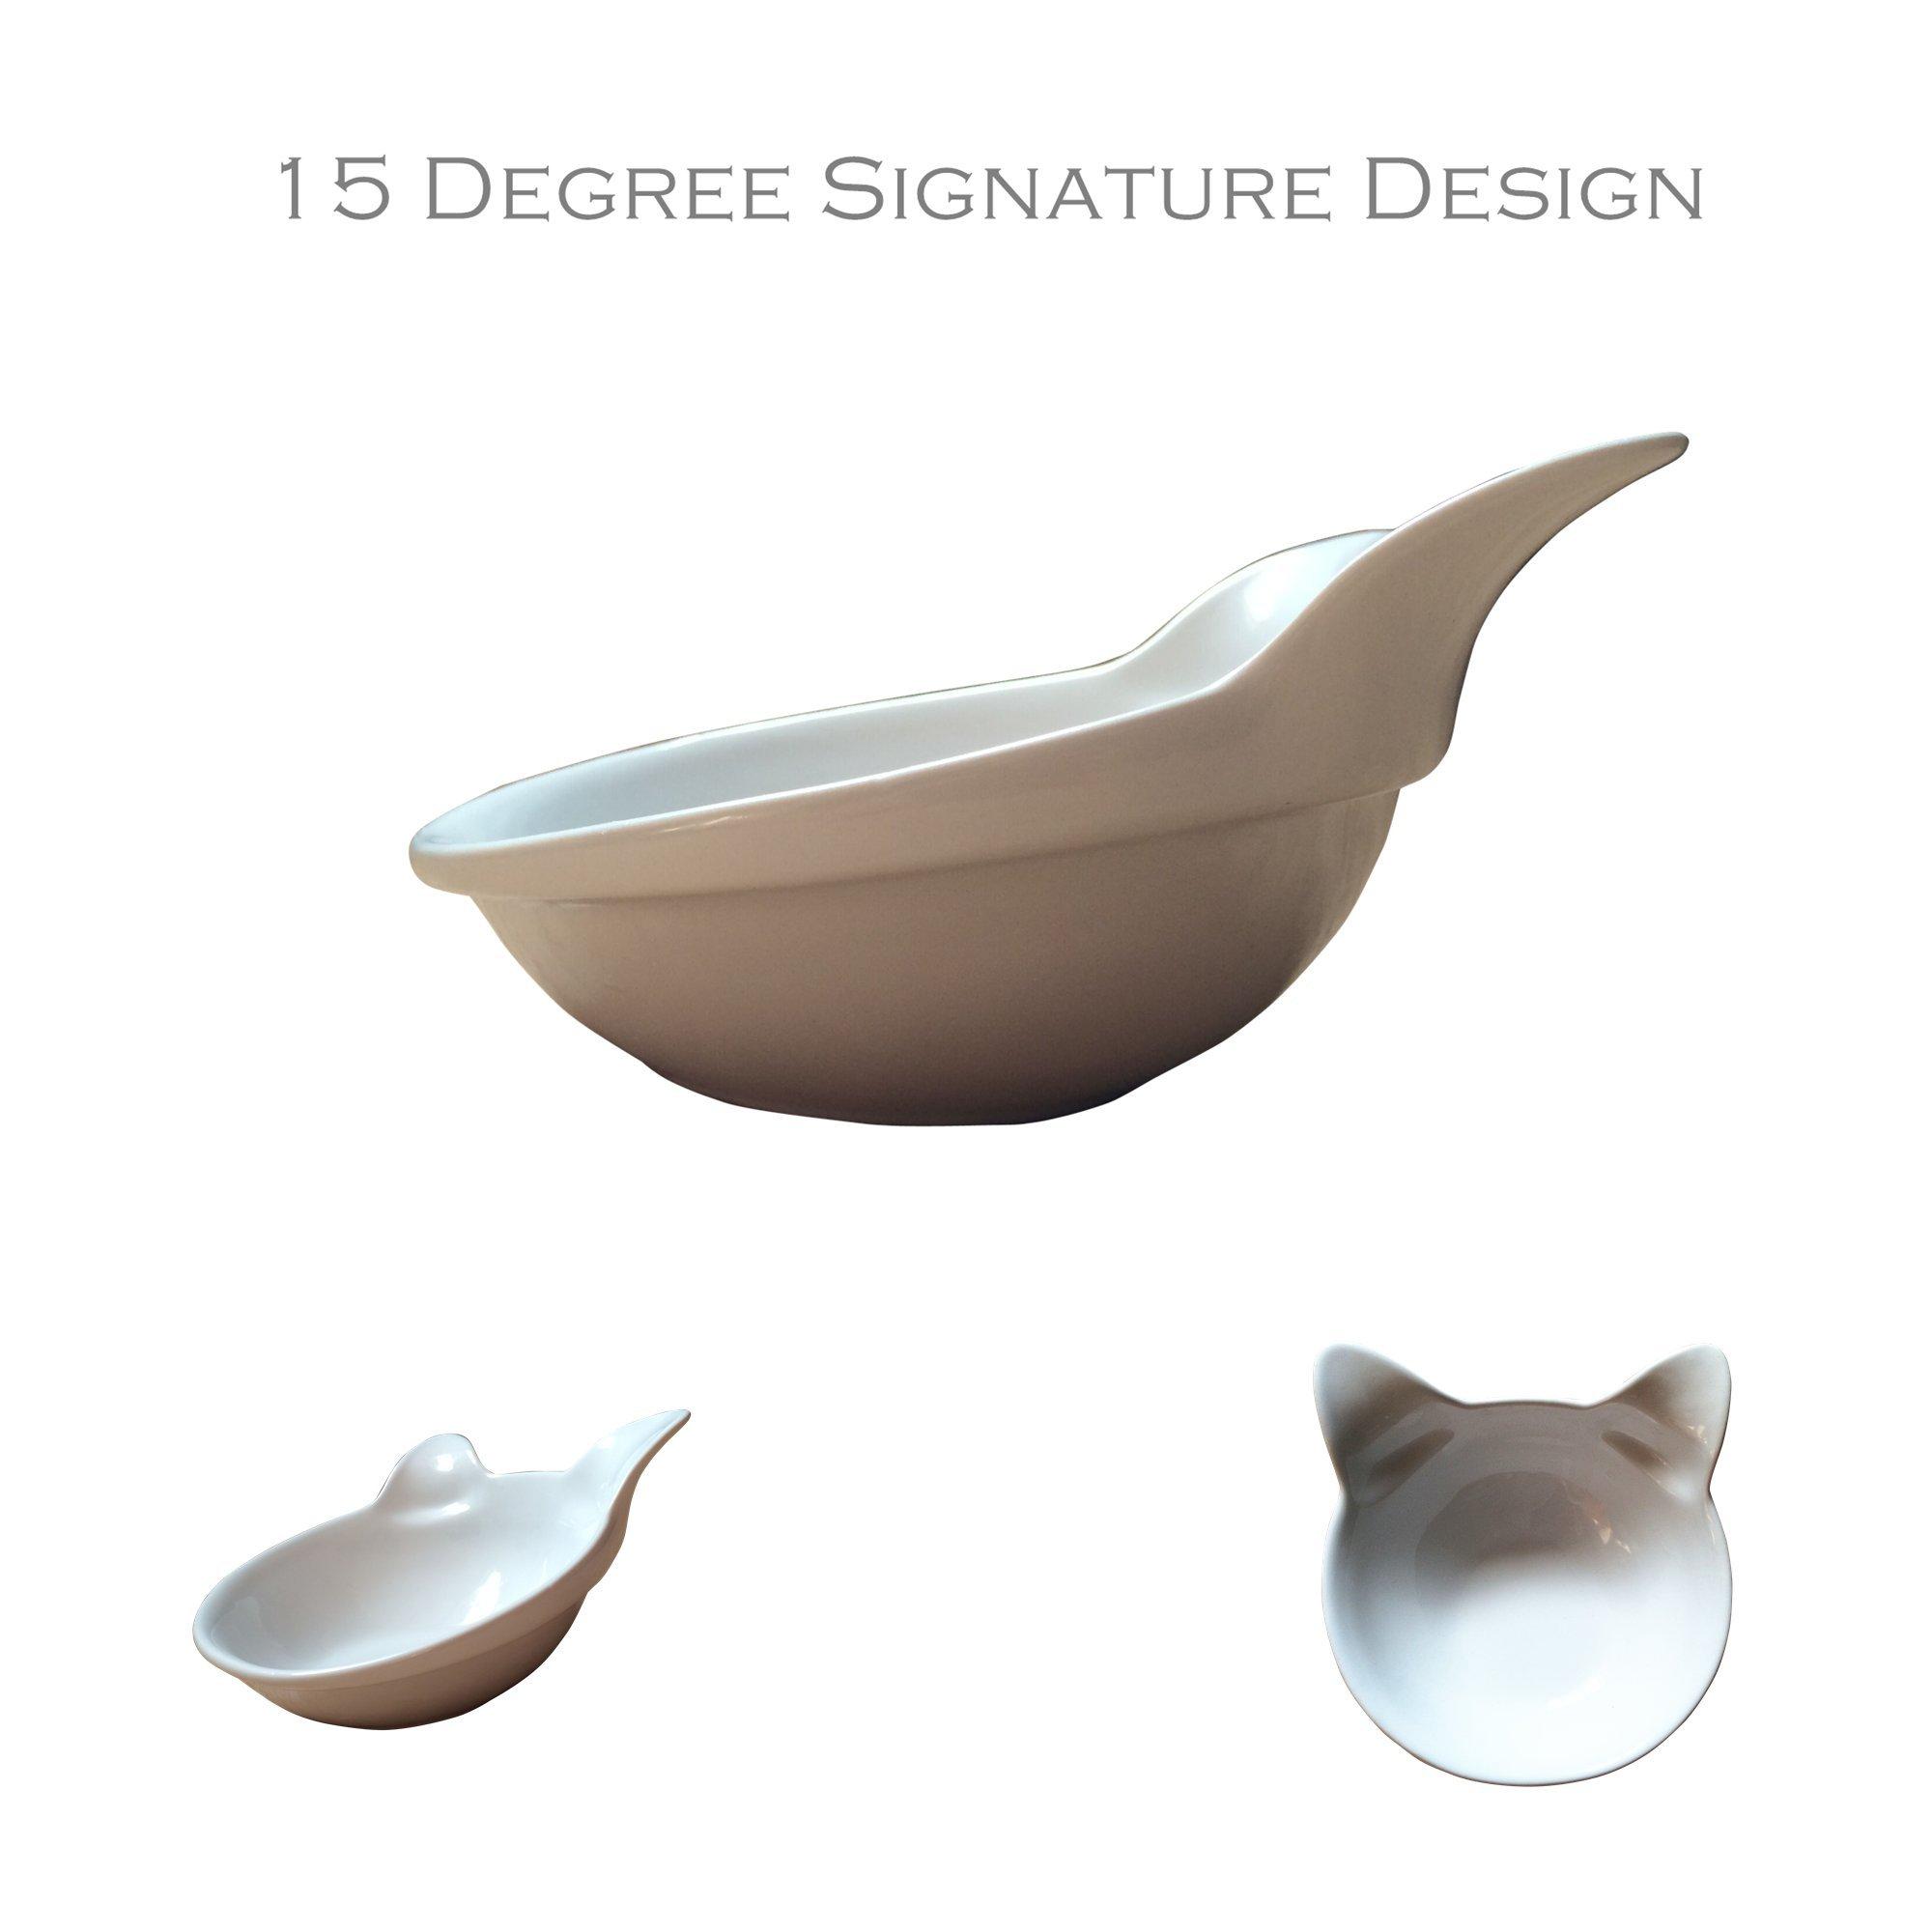 2 Ceramic Kitty Bowls from ViviPet (Pearl White Kitty Bowls)